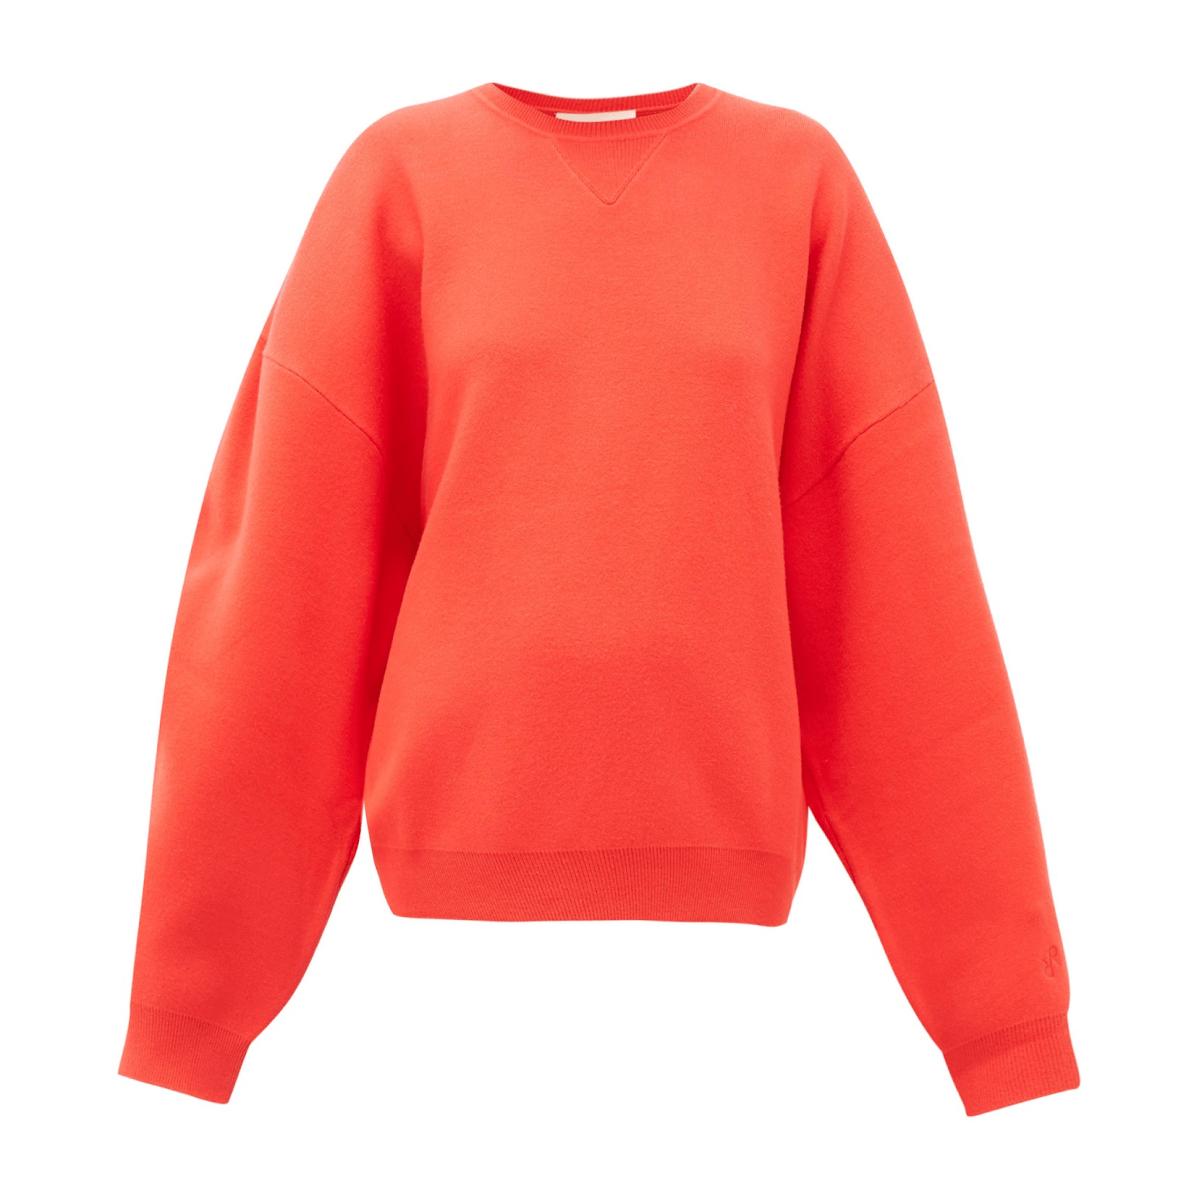 Roksanda sweatshirt